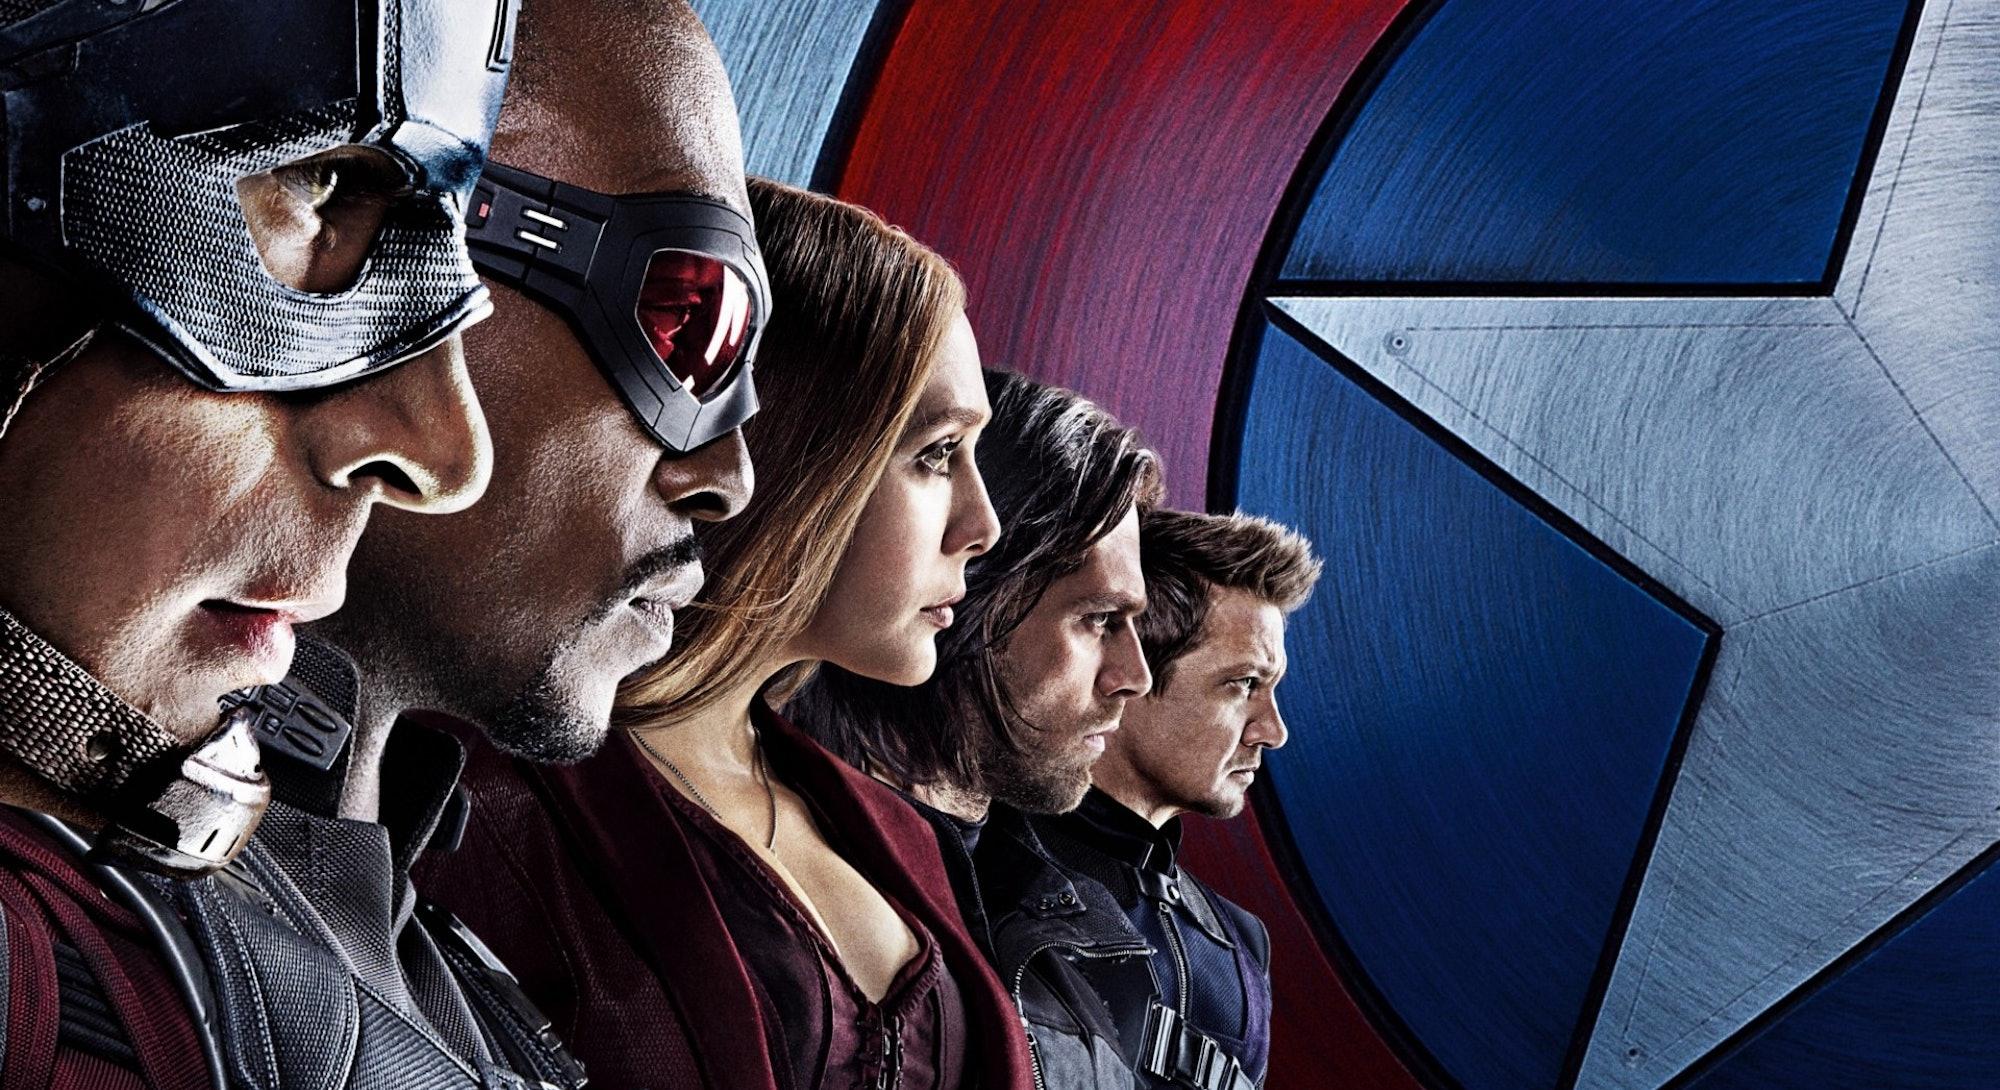 half of captain america civil war character poster facing right